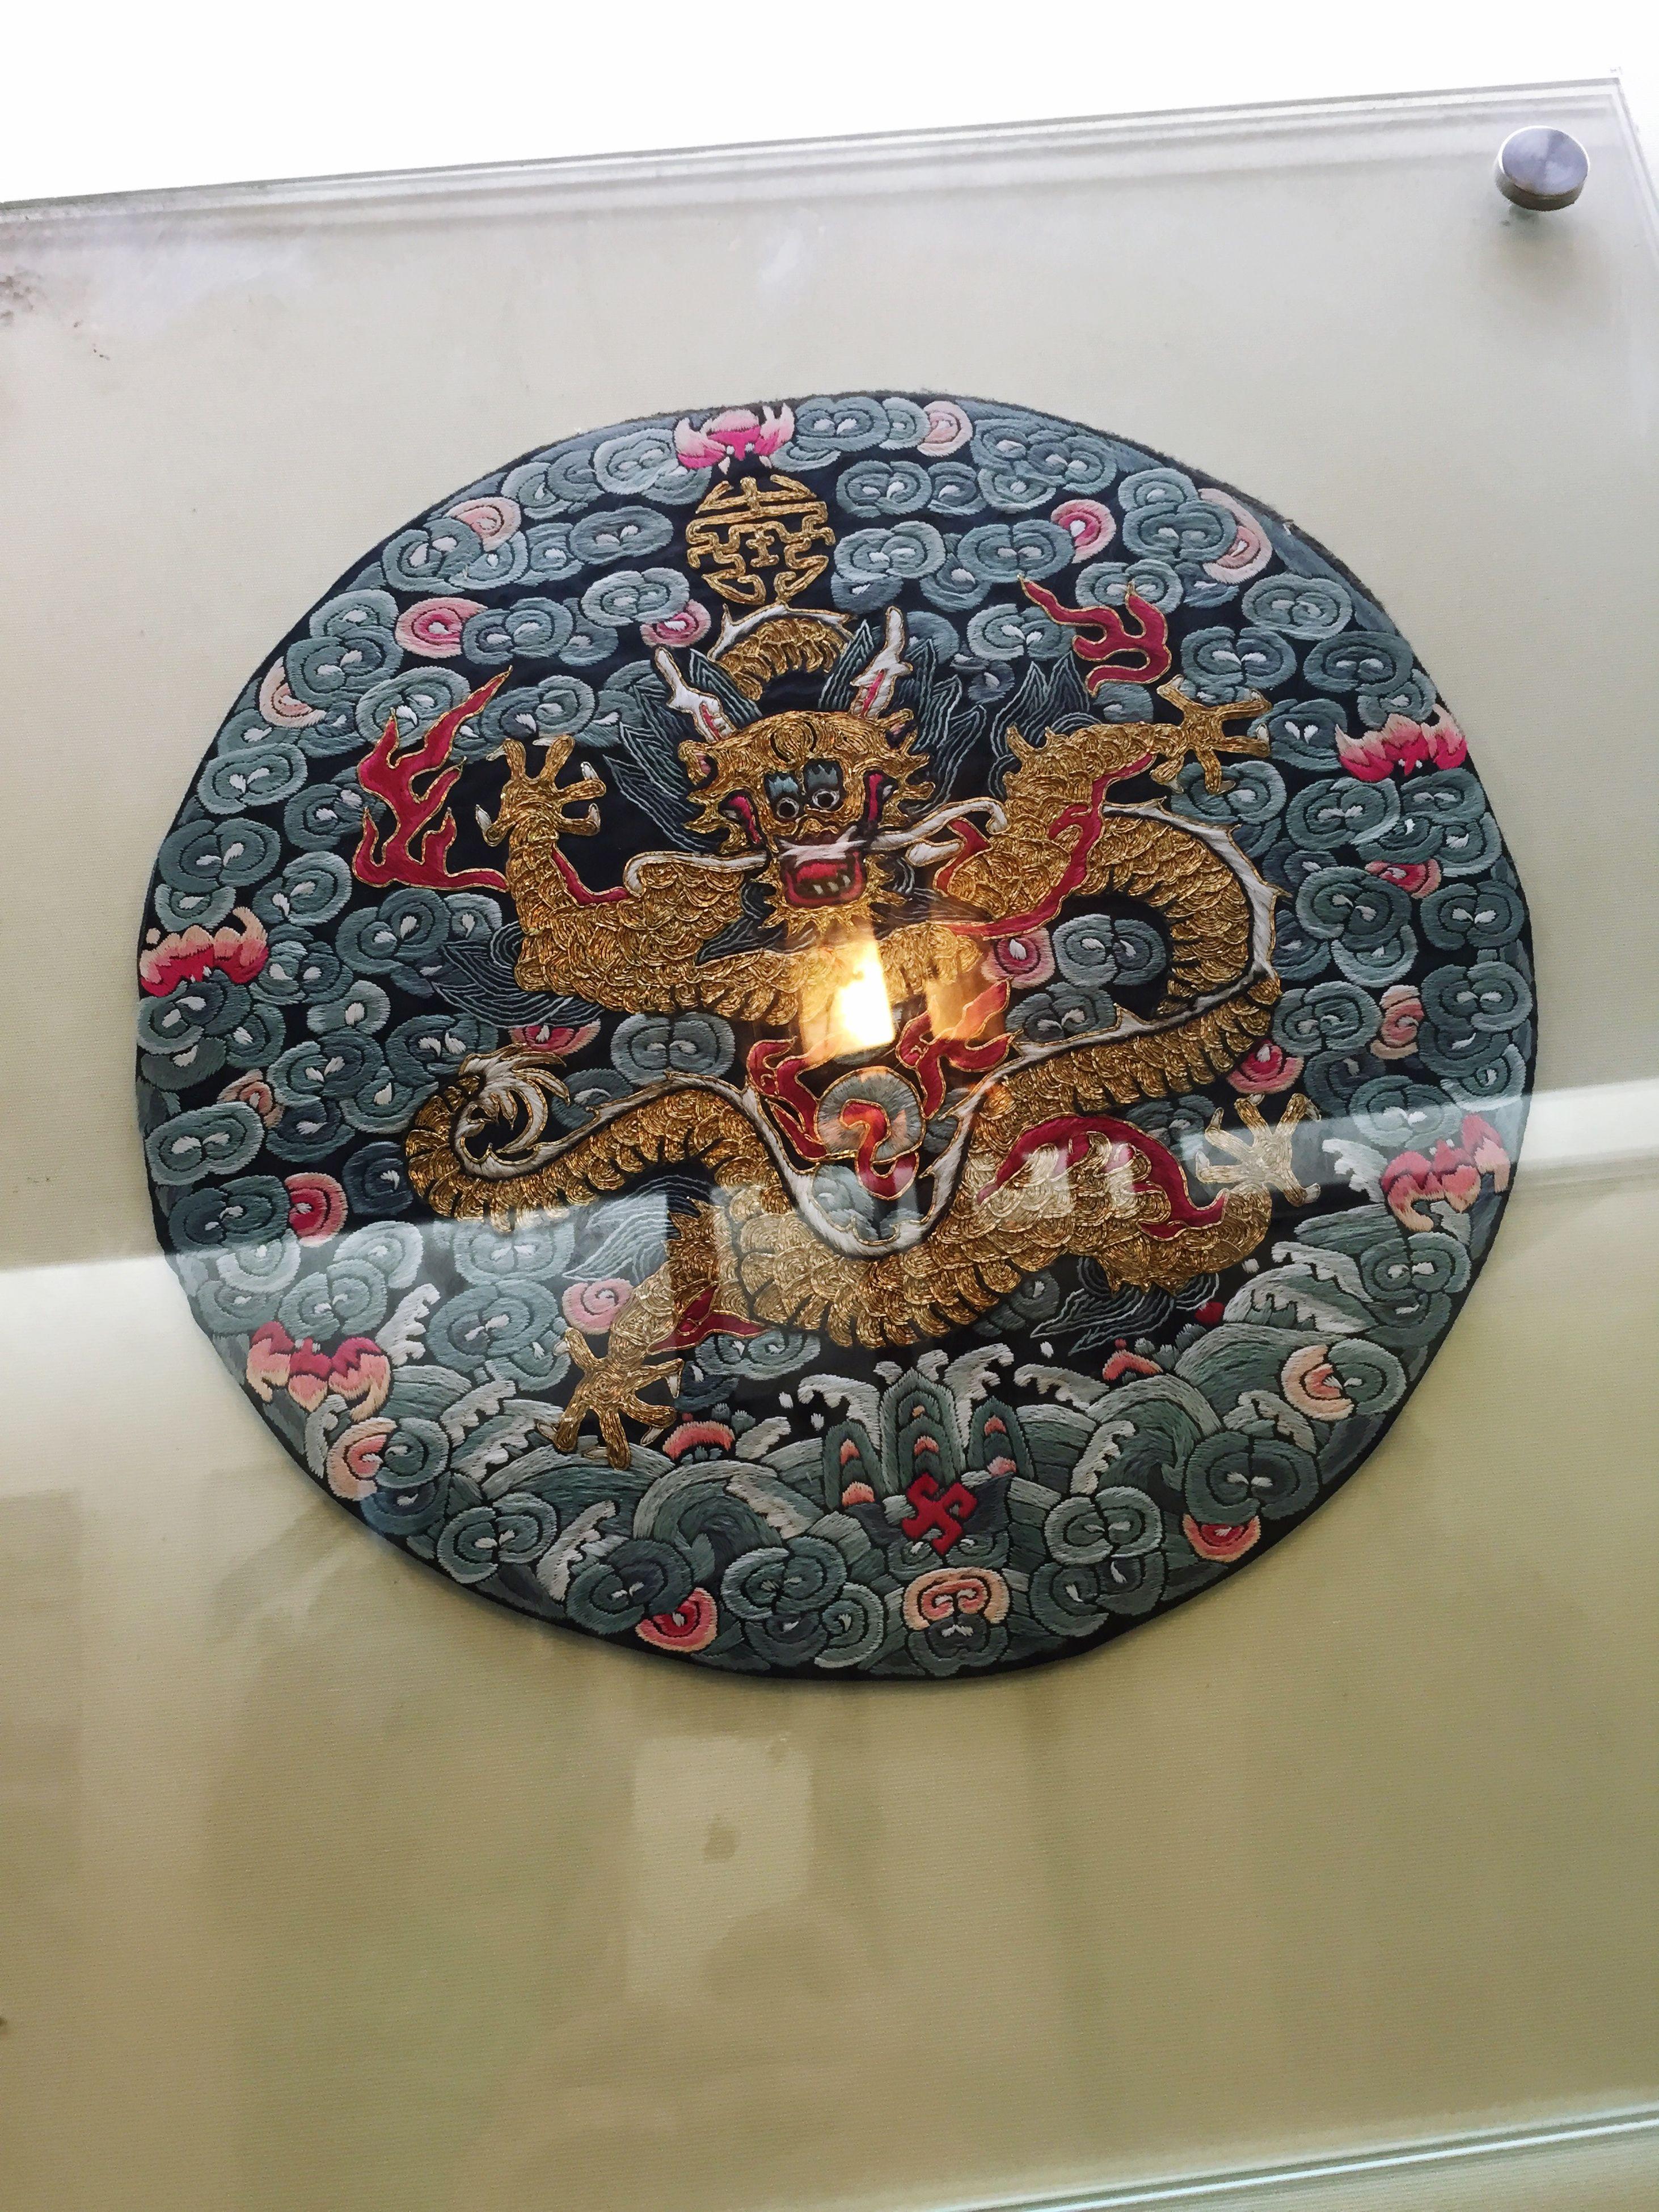 indoors, circle, pattern, art and craft, multi colored, design, creativity, decoration, art, ceiling, illuminated, low angle view, geometric shape, ornate, shape, close-up, no people, lighting equipment, celebration, religion